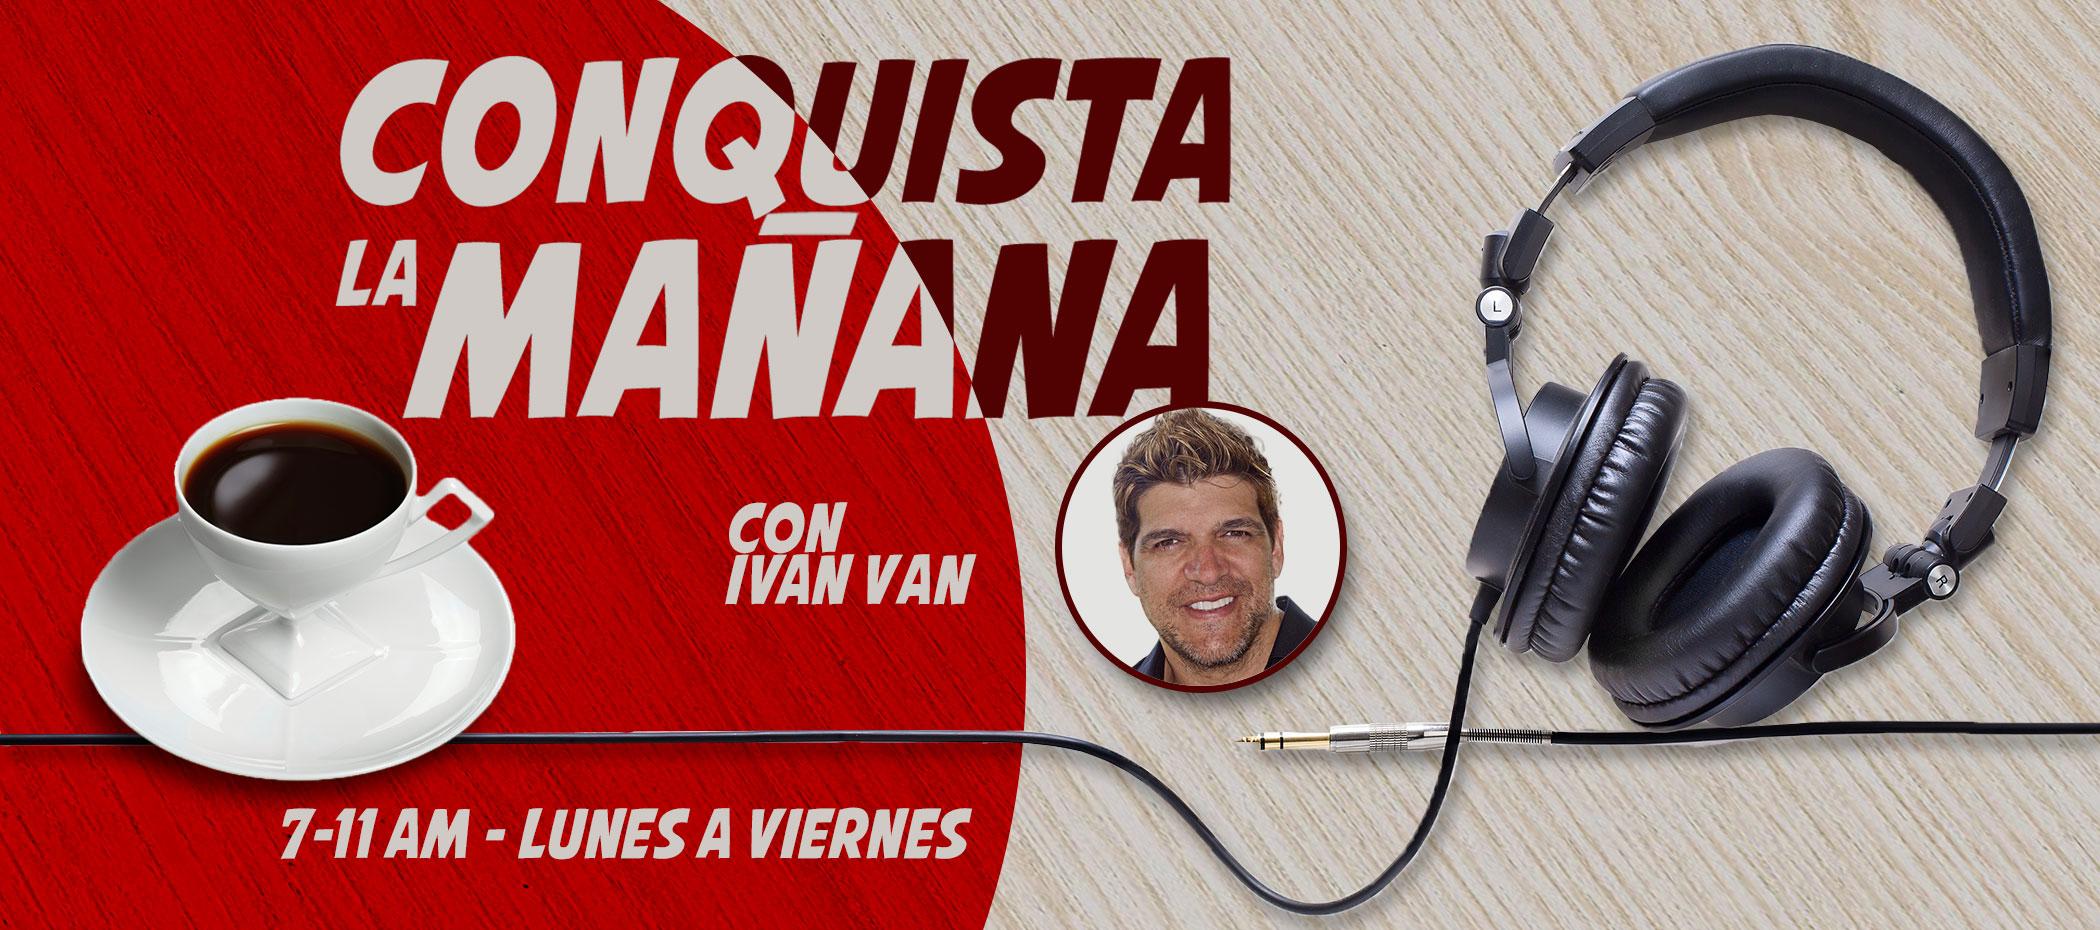 Conquista la Mañana con Ivan Van